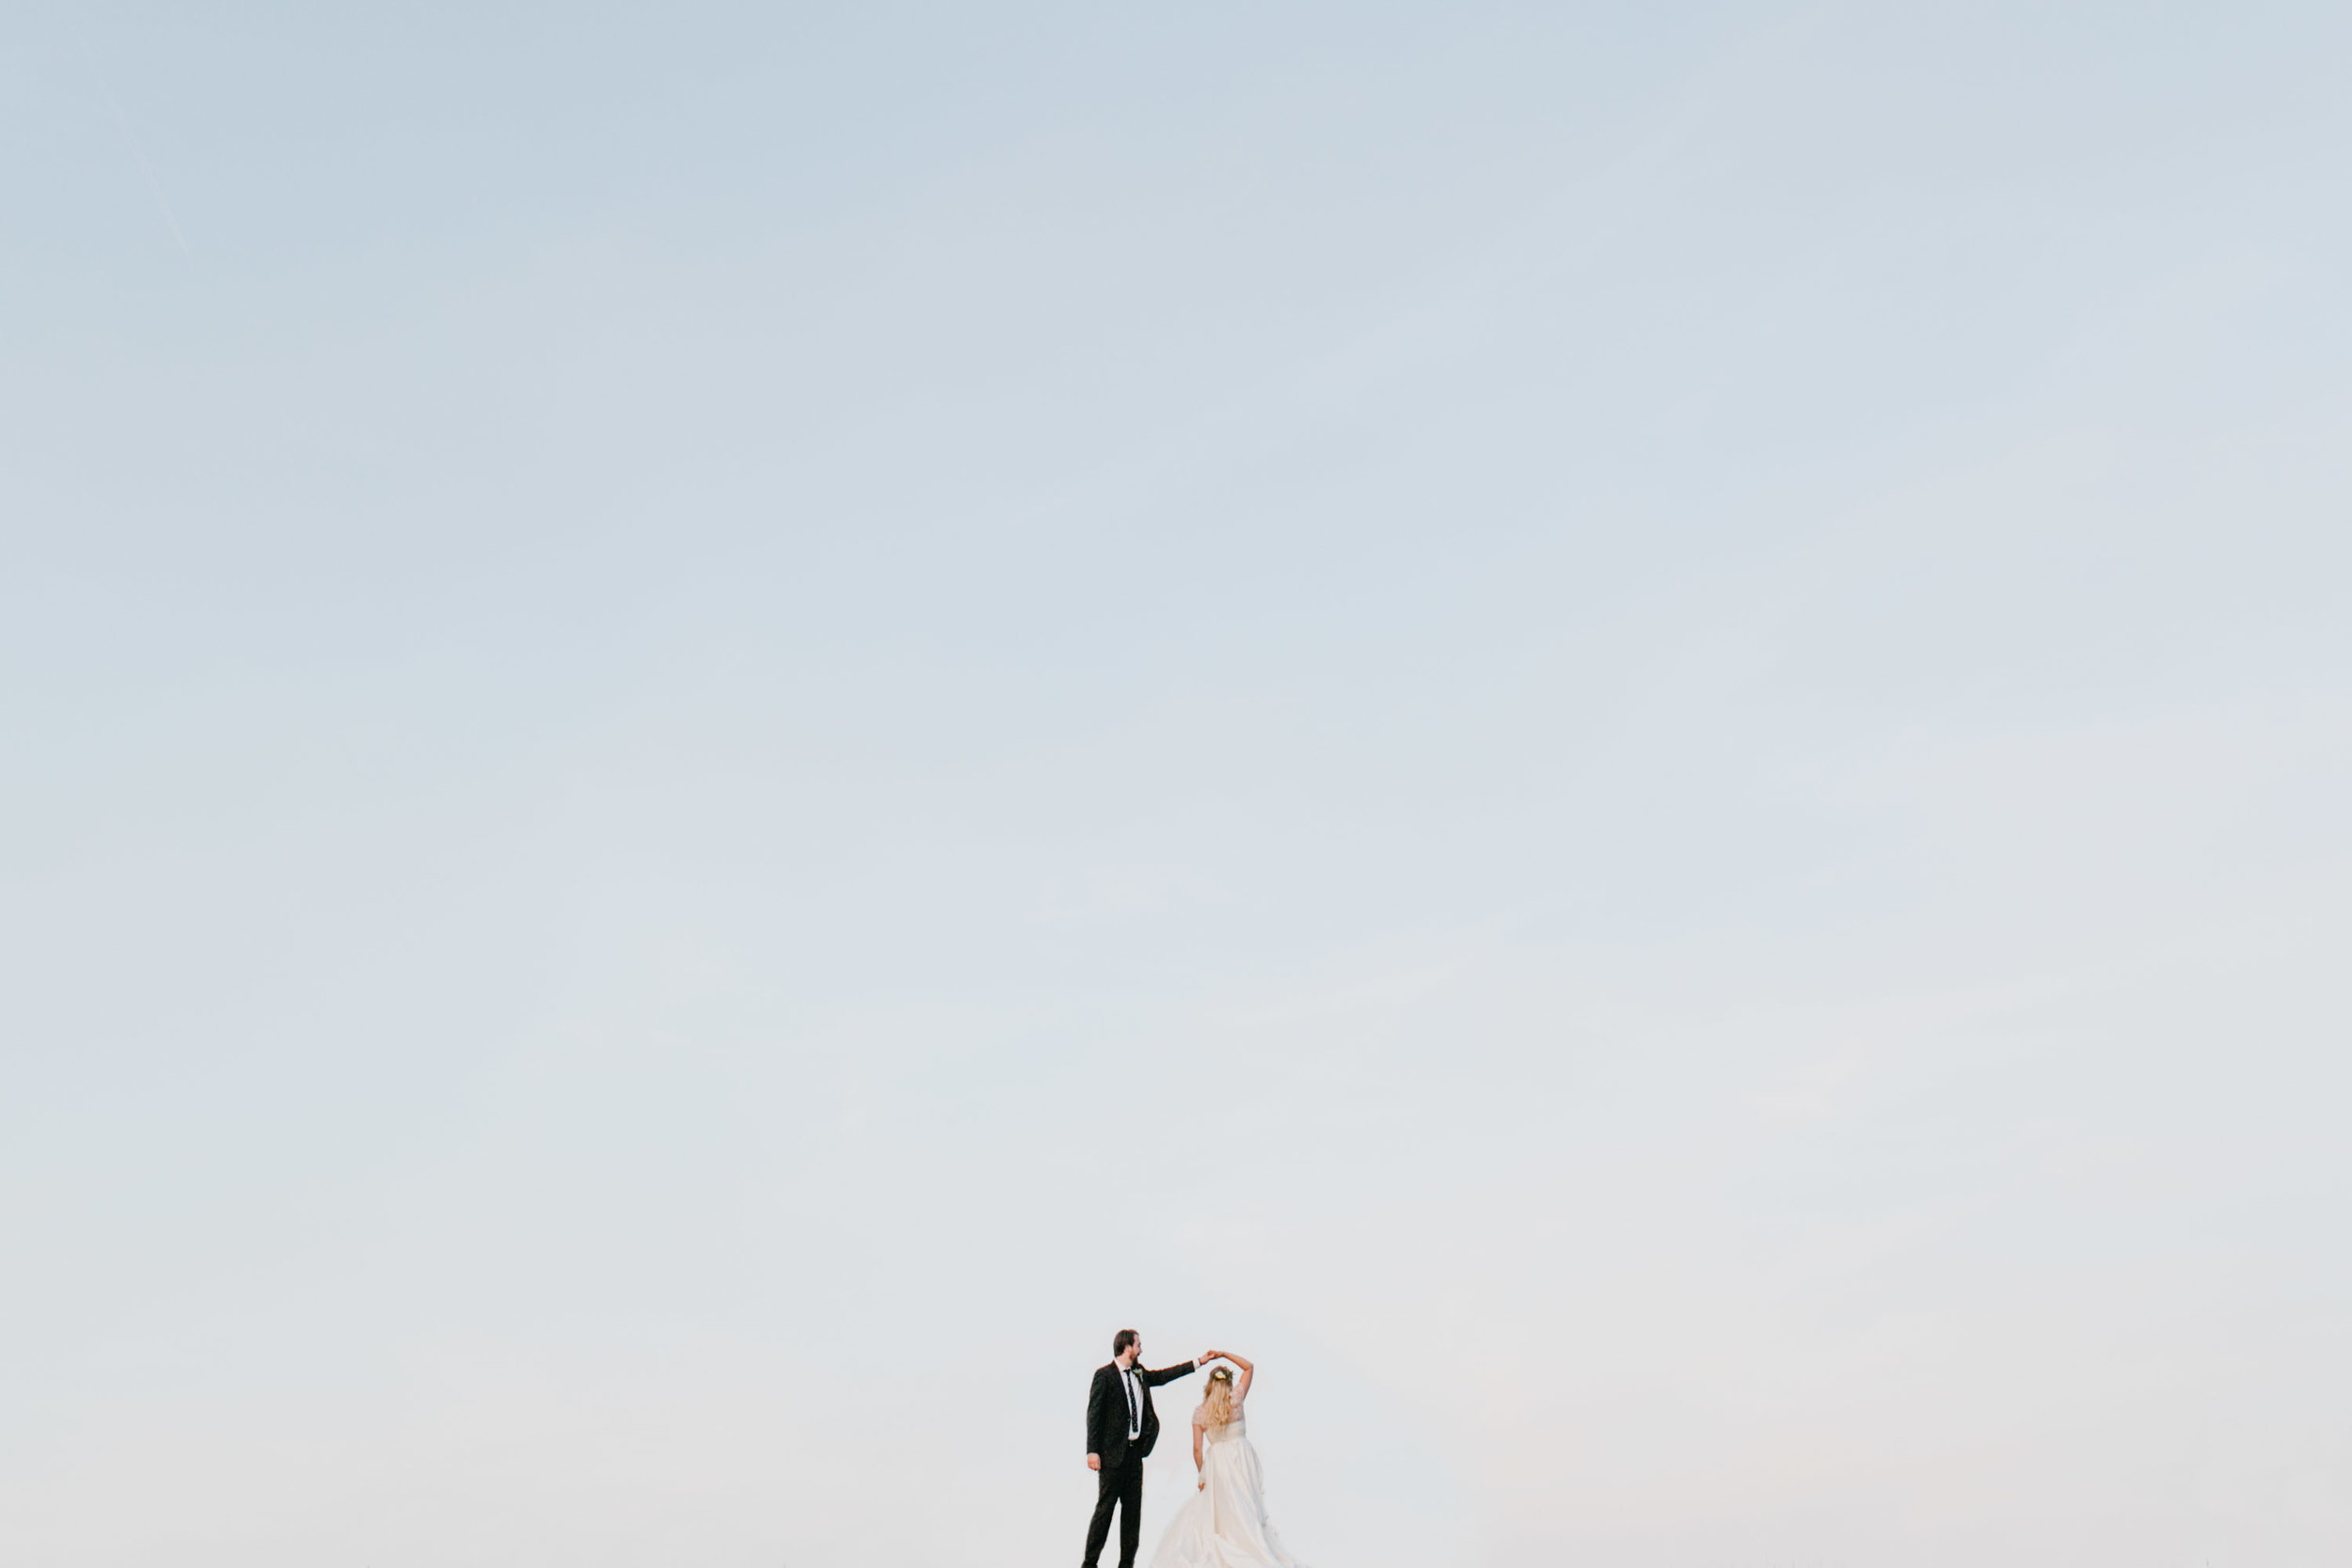 omaha-wedding-photographer_003.jpg